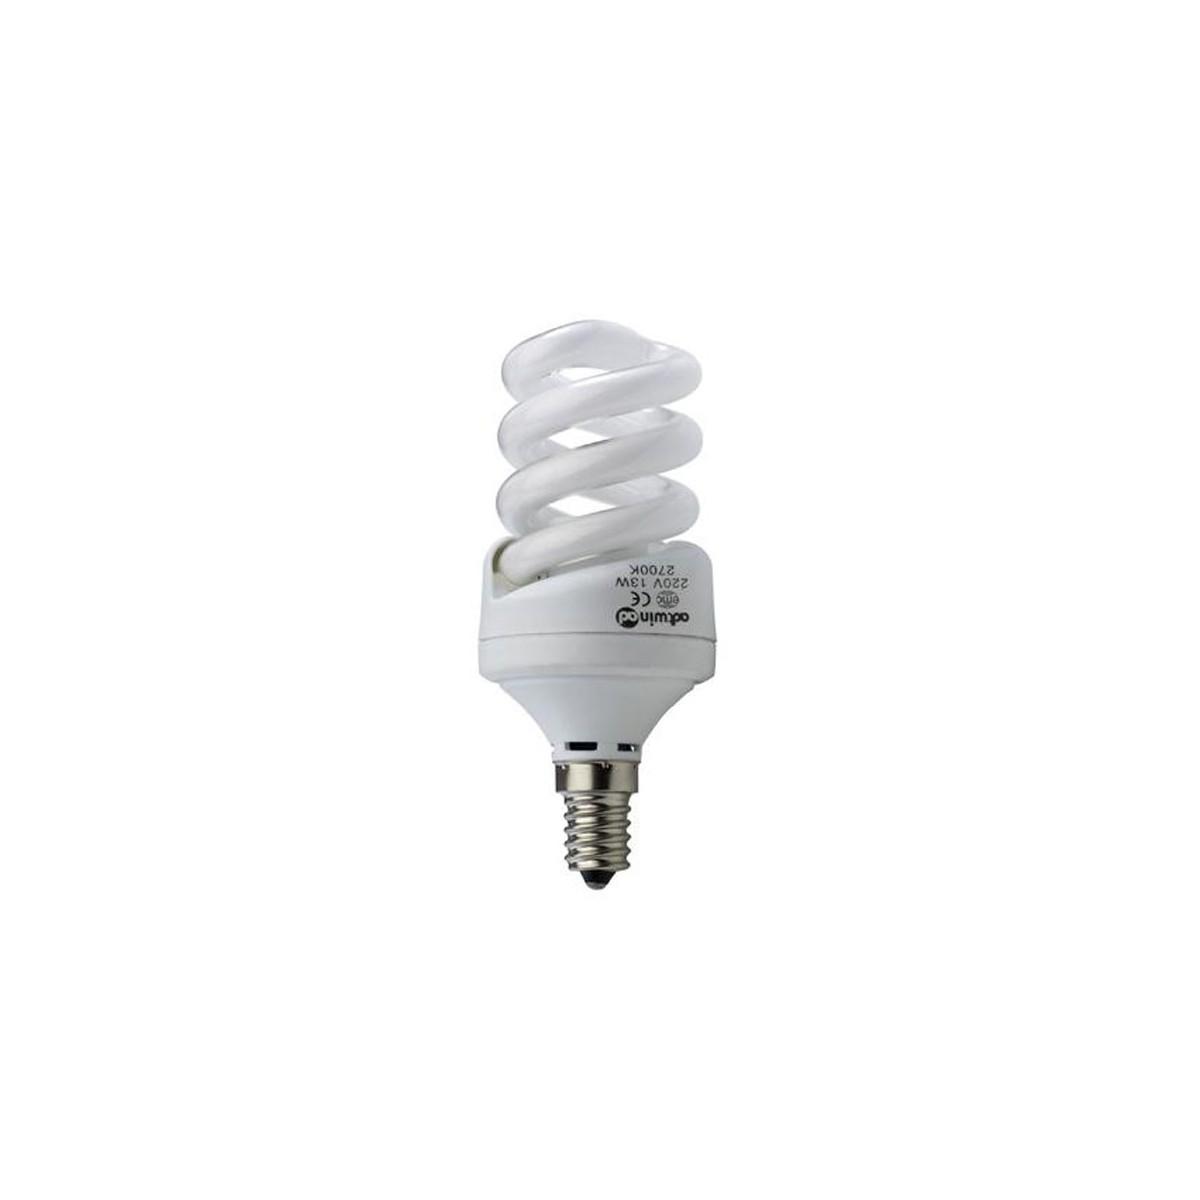 Bombilla espiral de bajo consumo E14, 13W, 4200K.